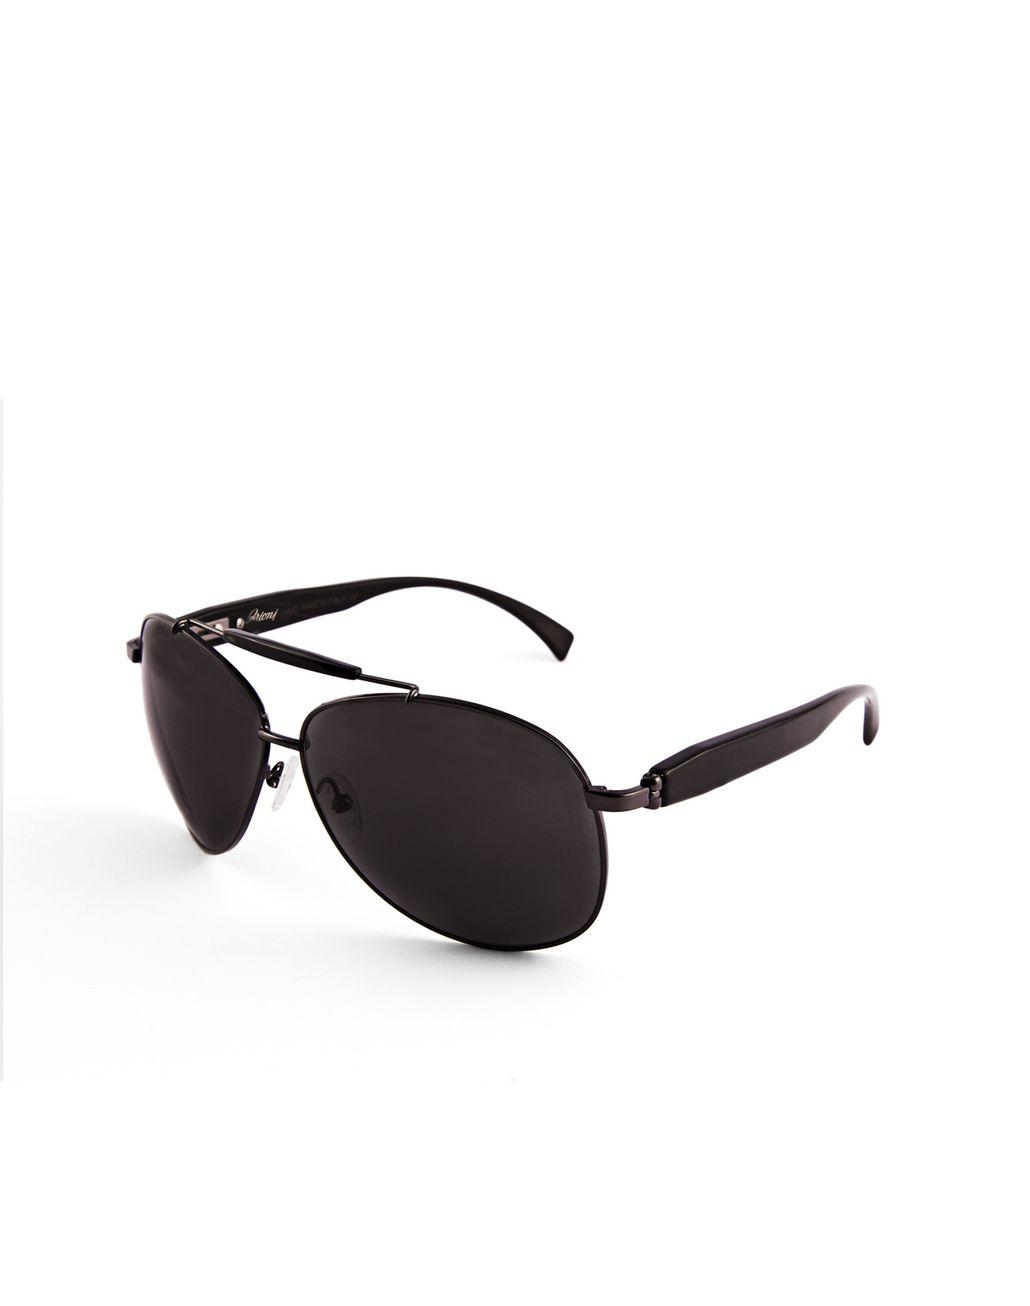 4451eb6ae5 BRIONI SUNGLASSES Sunglasses Man f